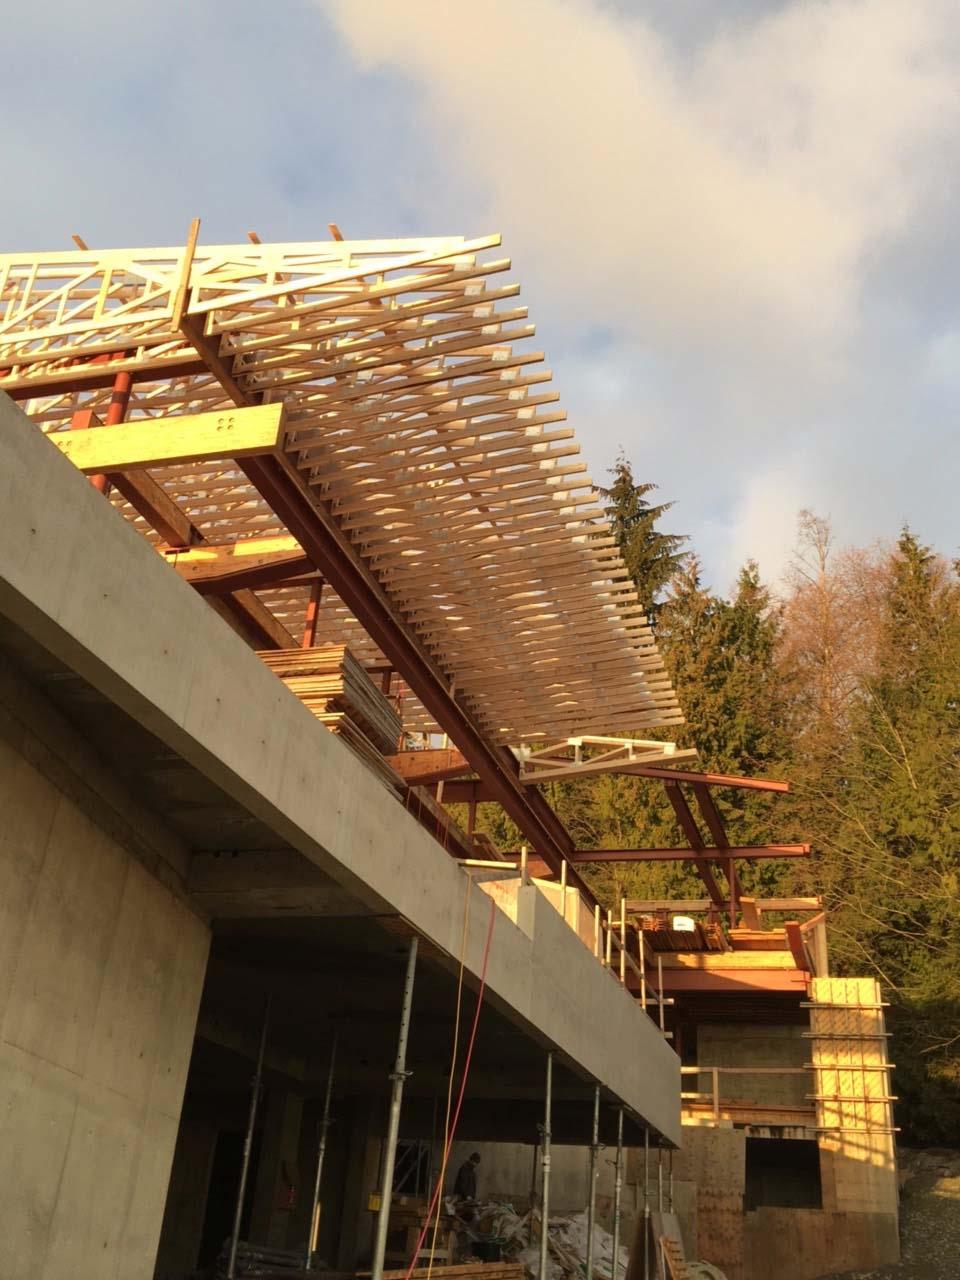 Postle_Construction_WoodFraming4.jpg